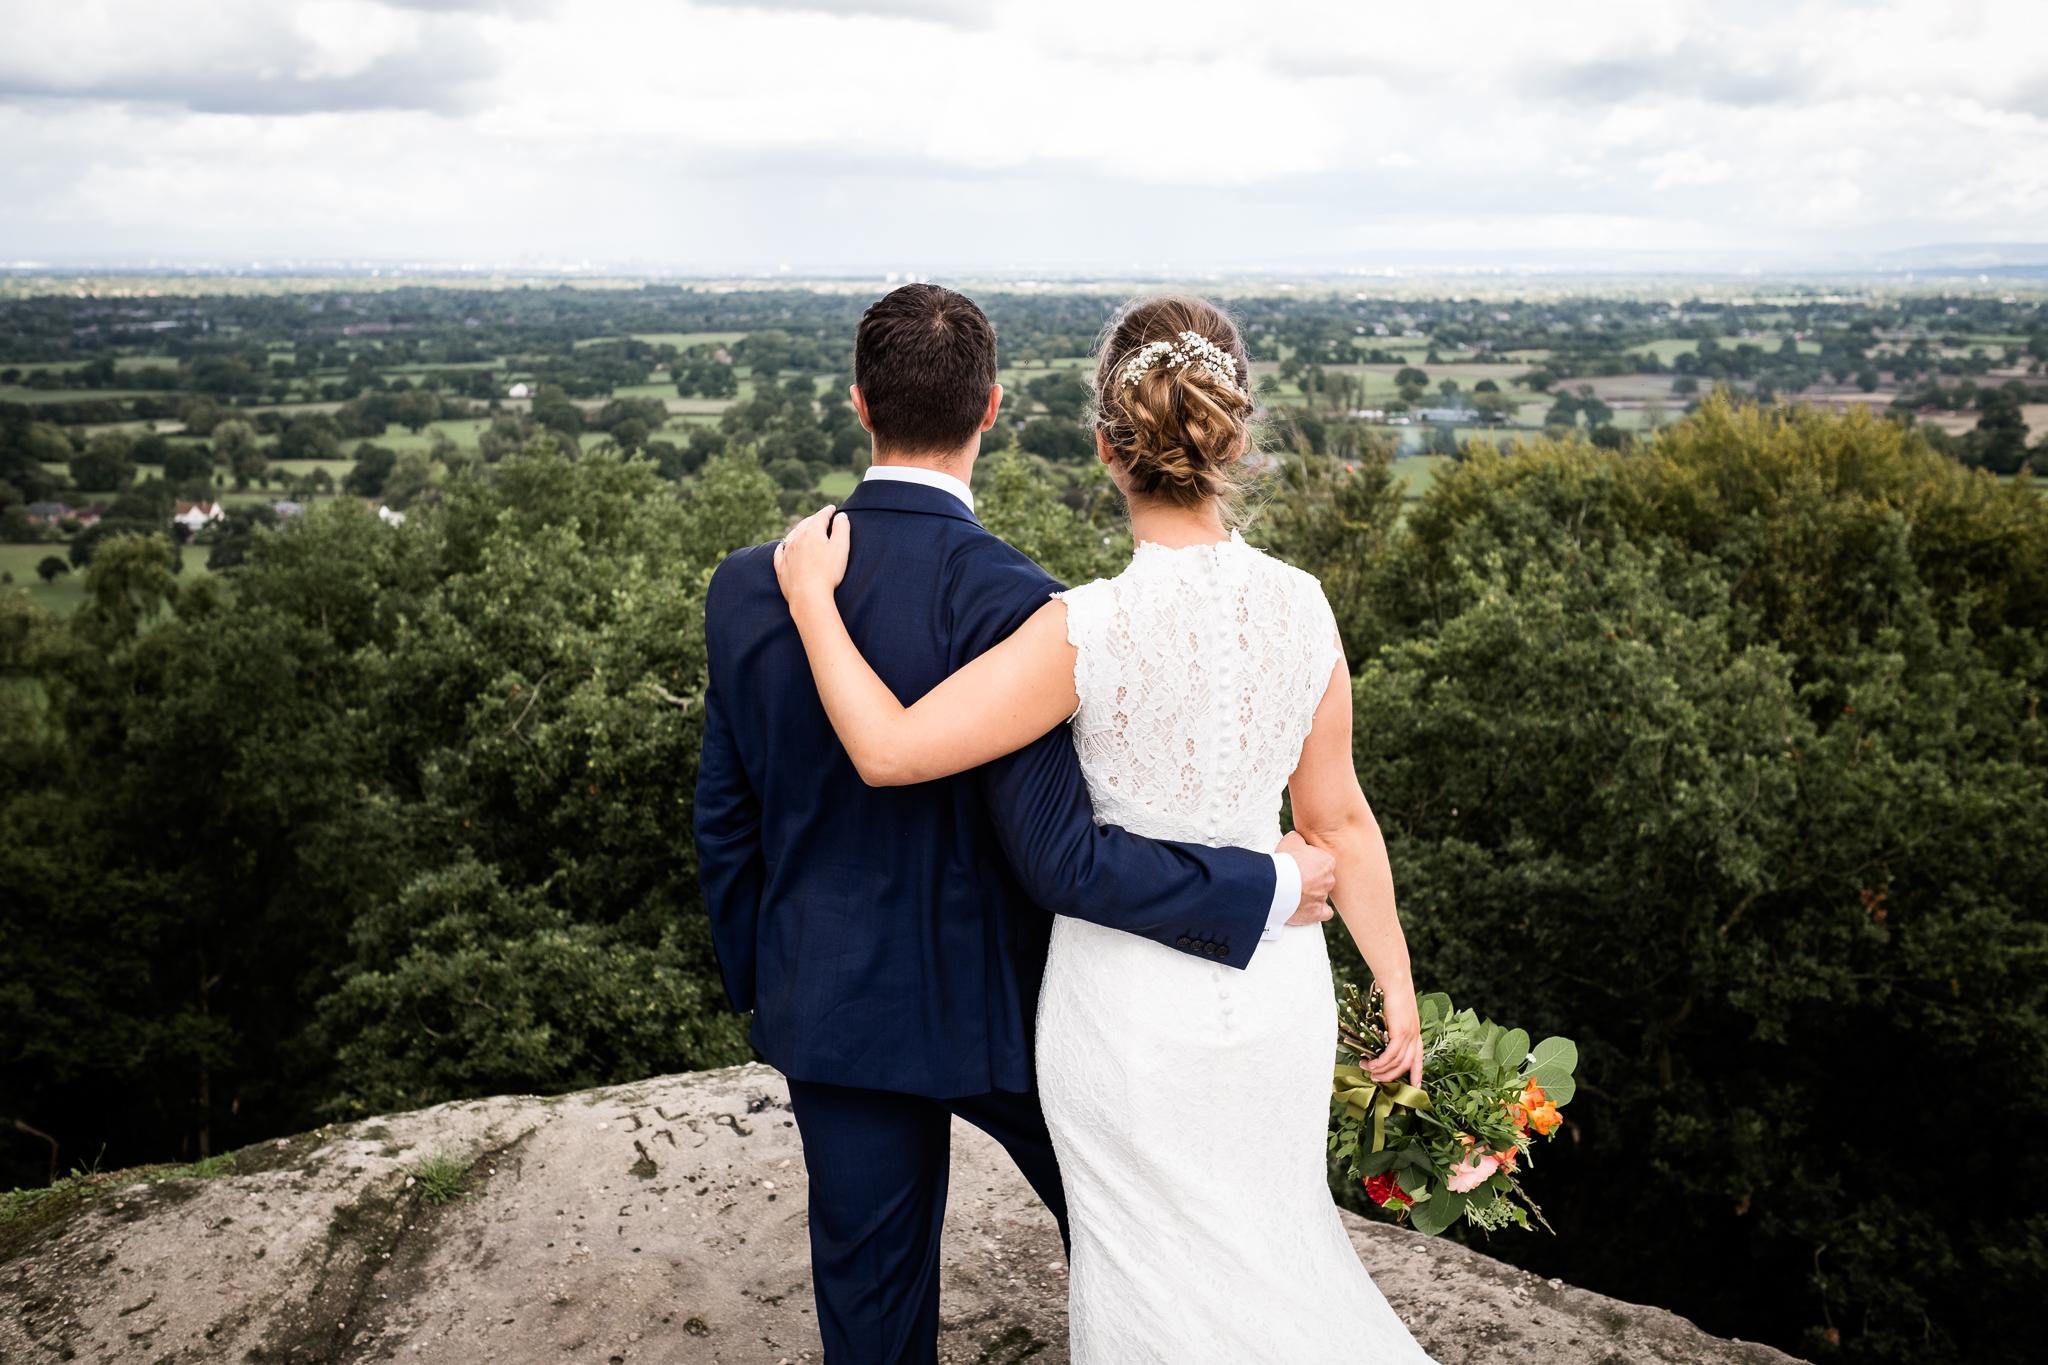 Relaxed Documentary Wedding Photography at The Wizard Inn, Alderley Edge Cheshire - Jenny Harper-46.jpg